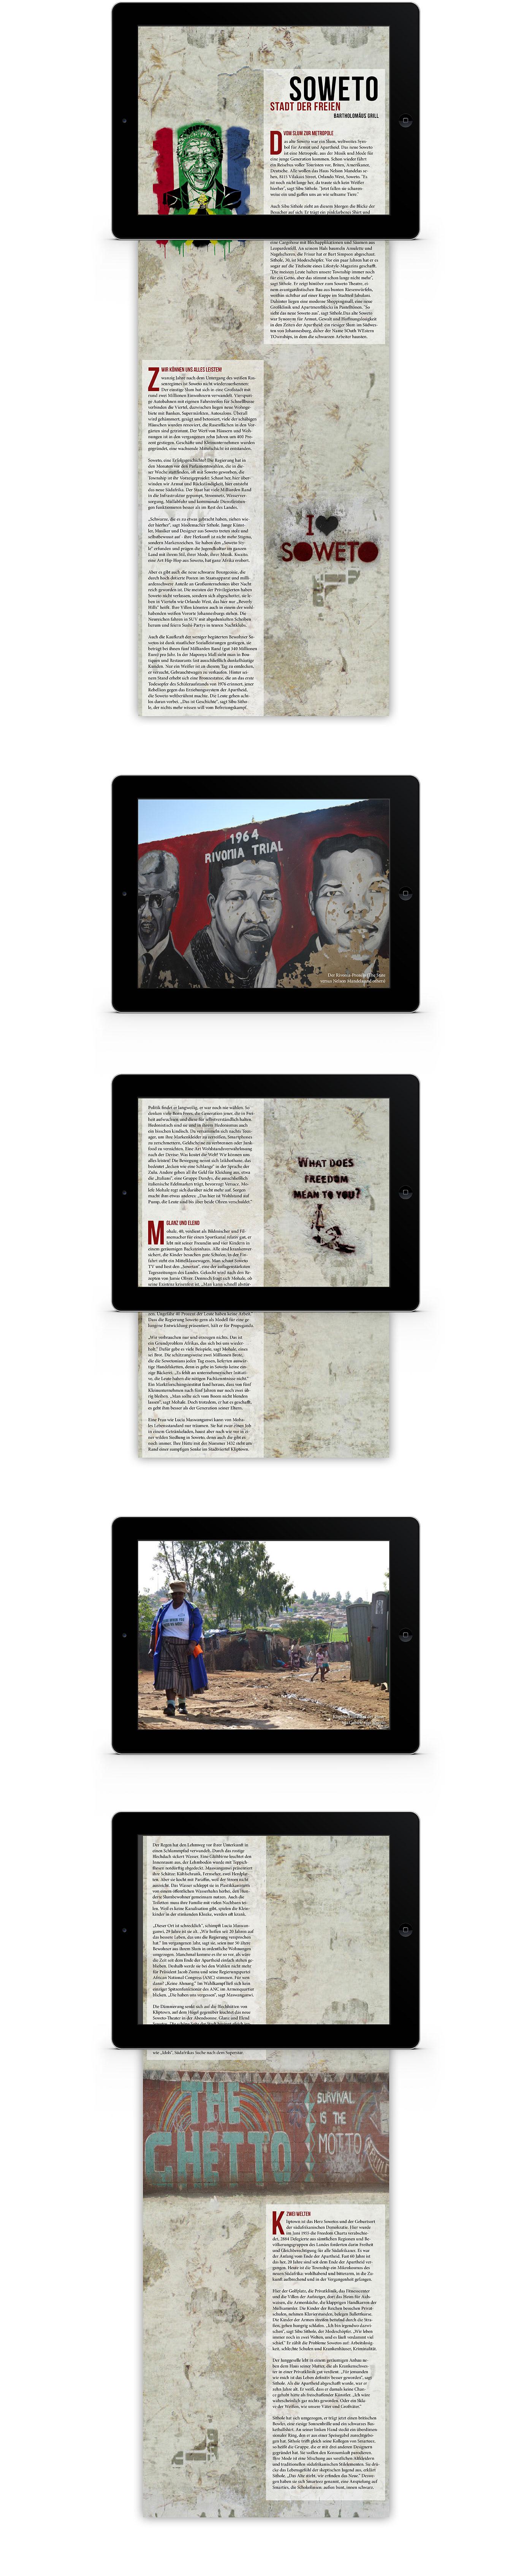 Layout interaktives iPad Magazin Reportage Taxi Soweto | Grafik Design Freelancer Berlin